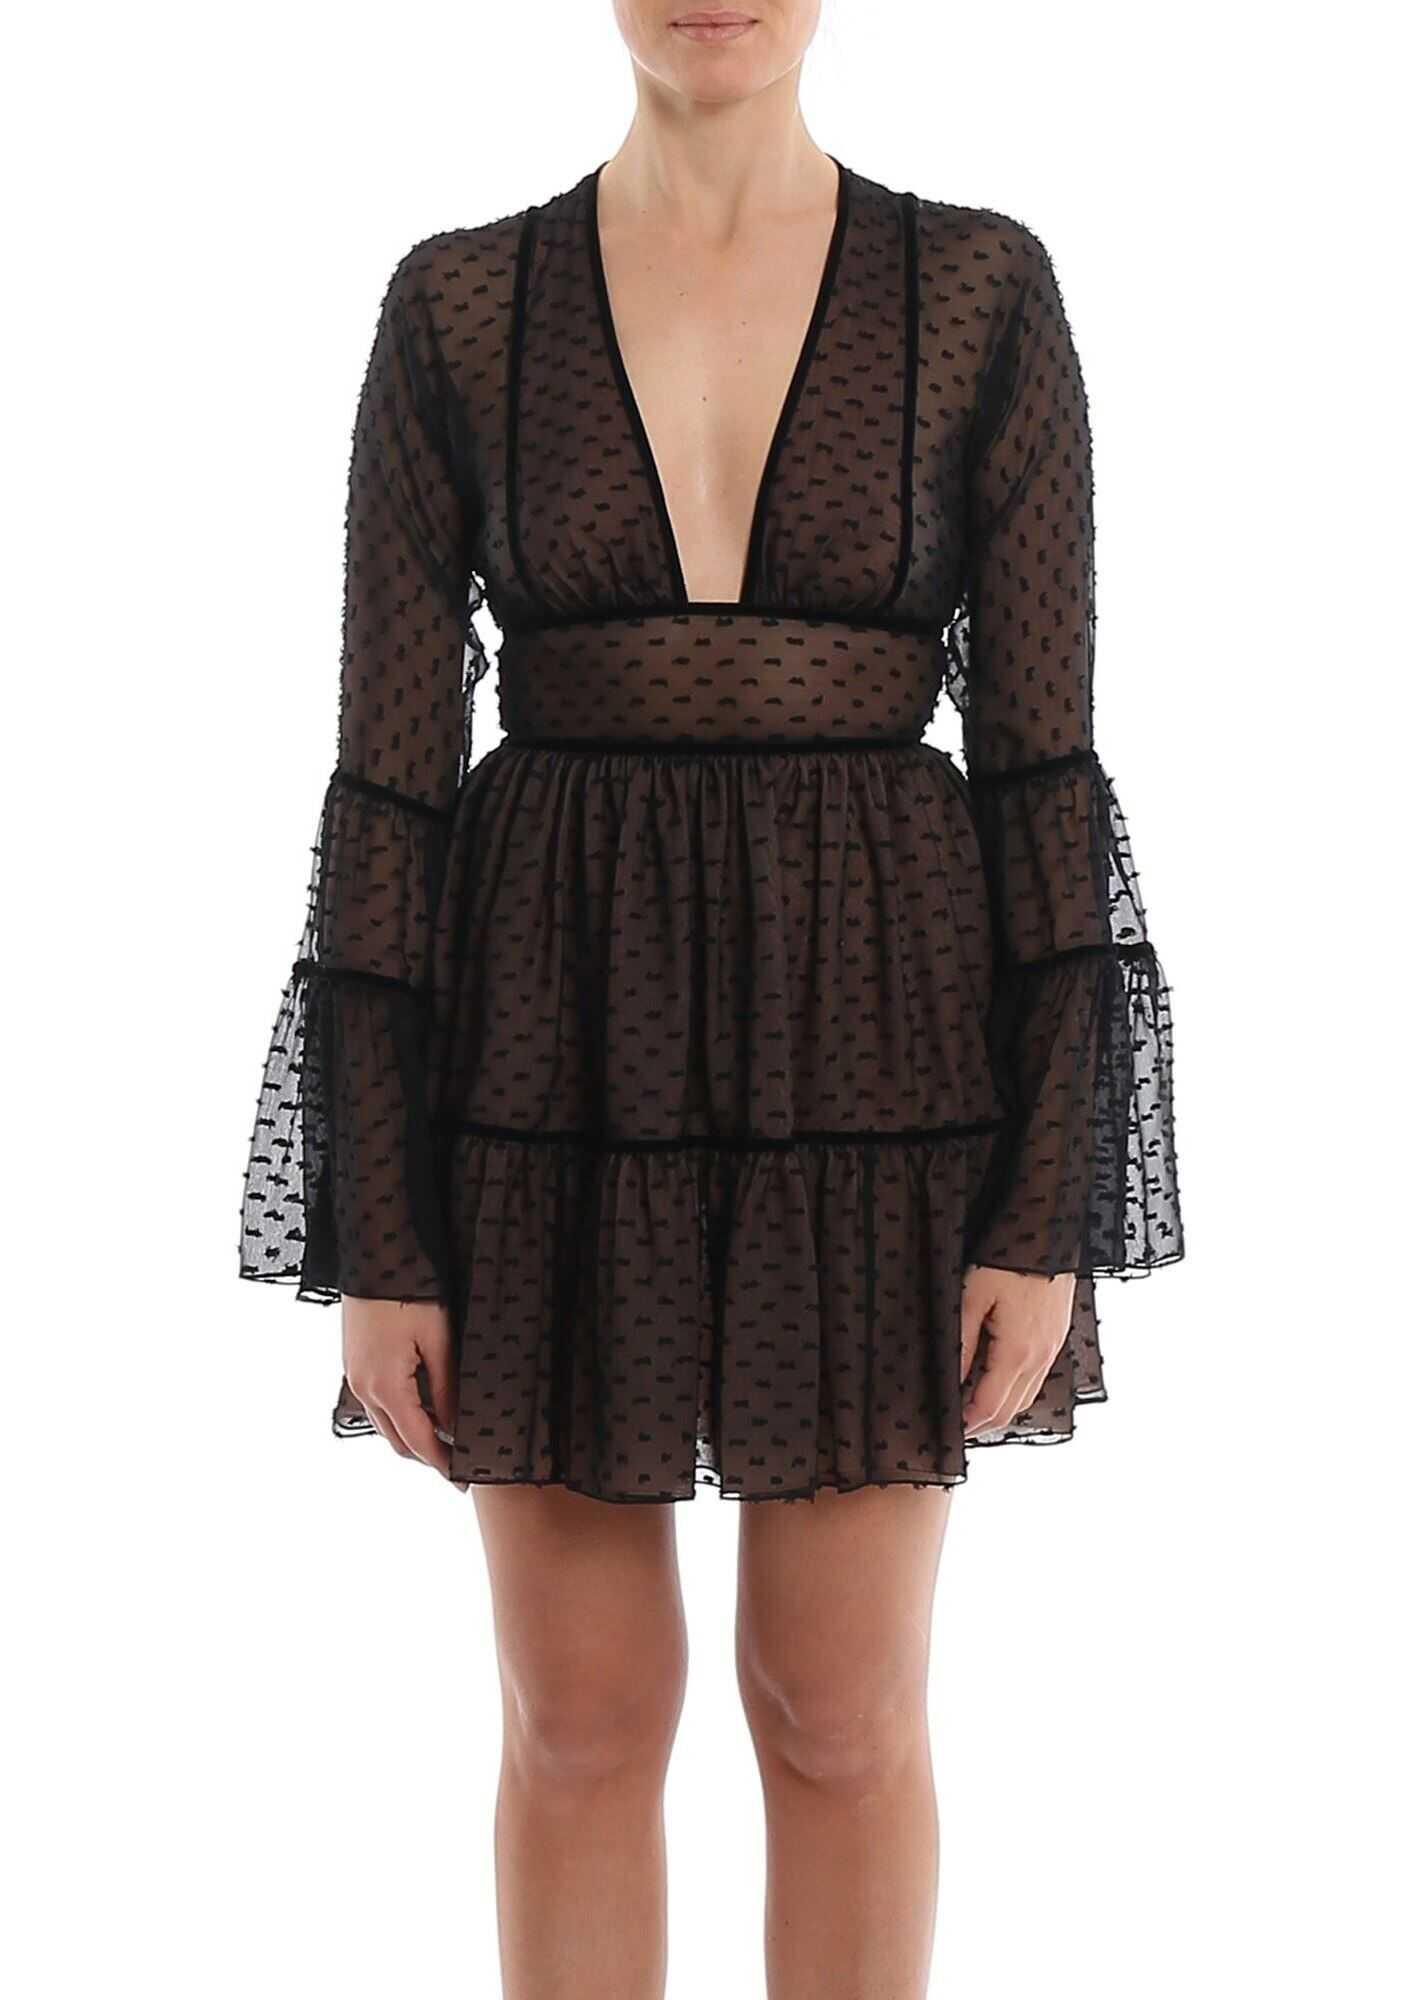 DSQUARED2 Sheer Silk Chiffon Short Dress Black